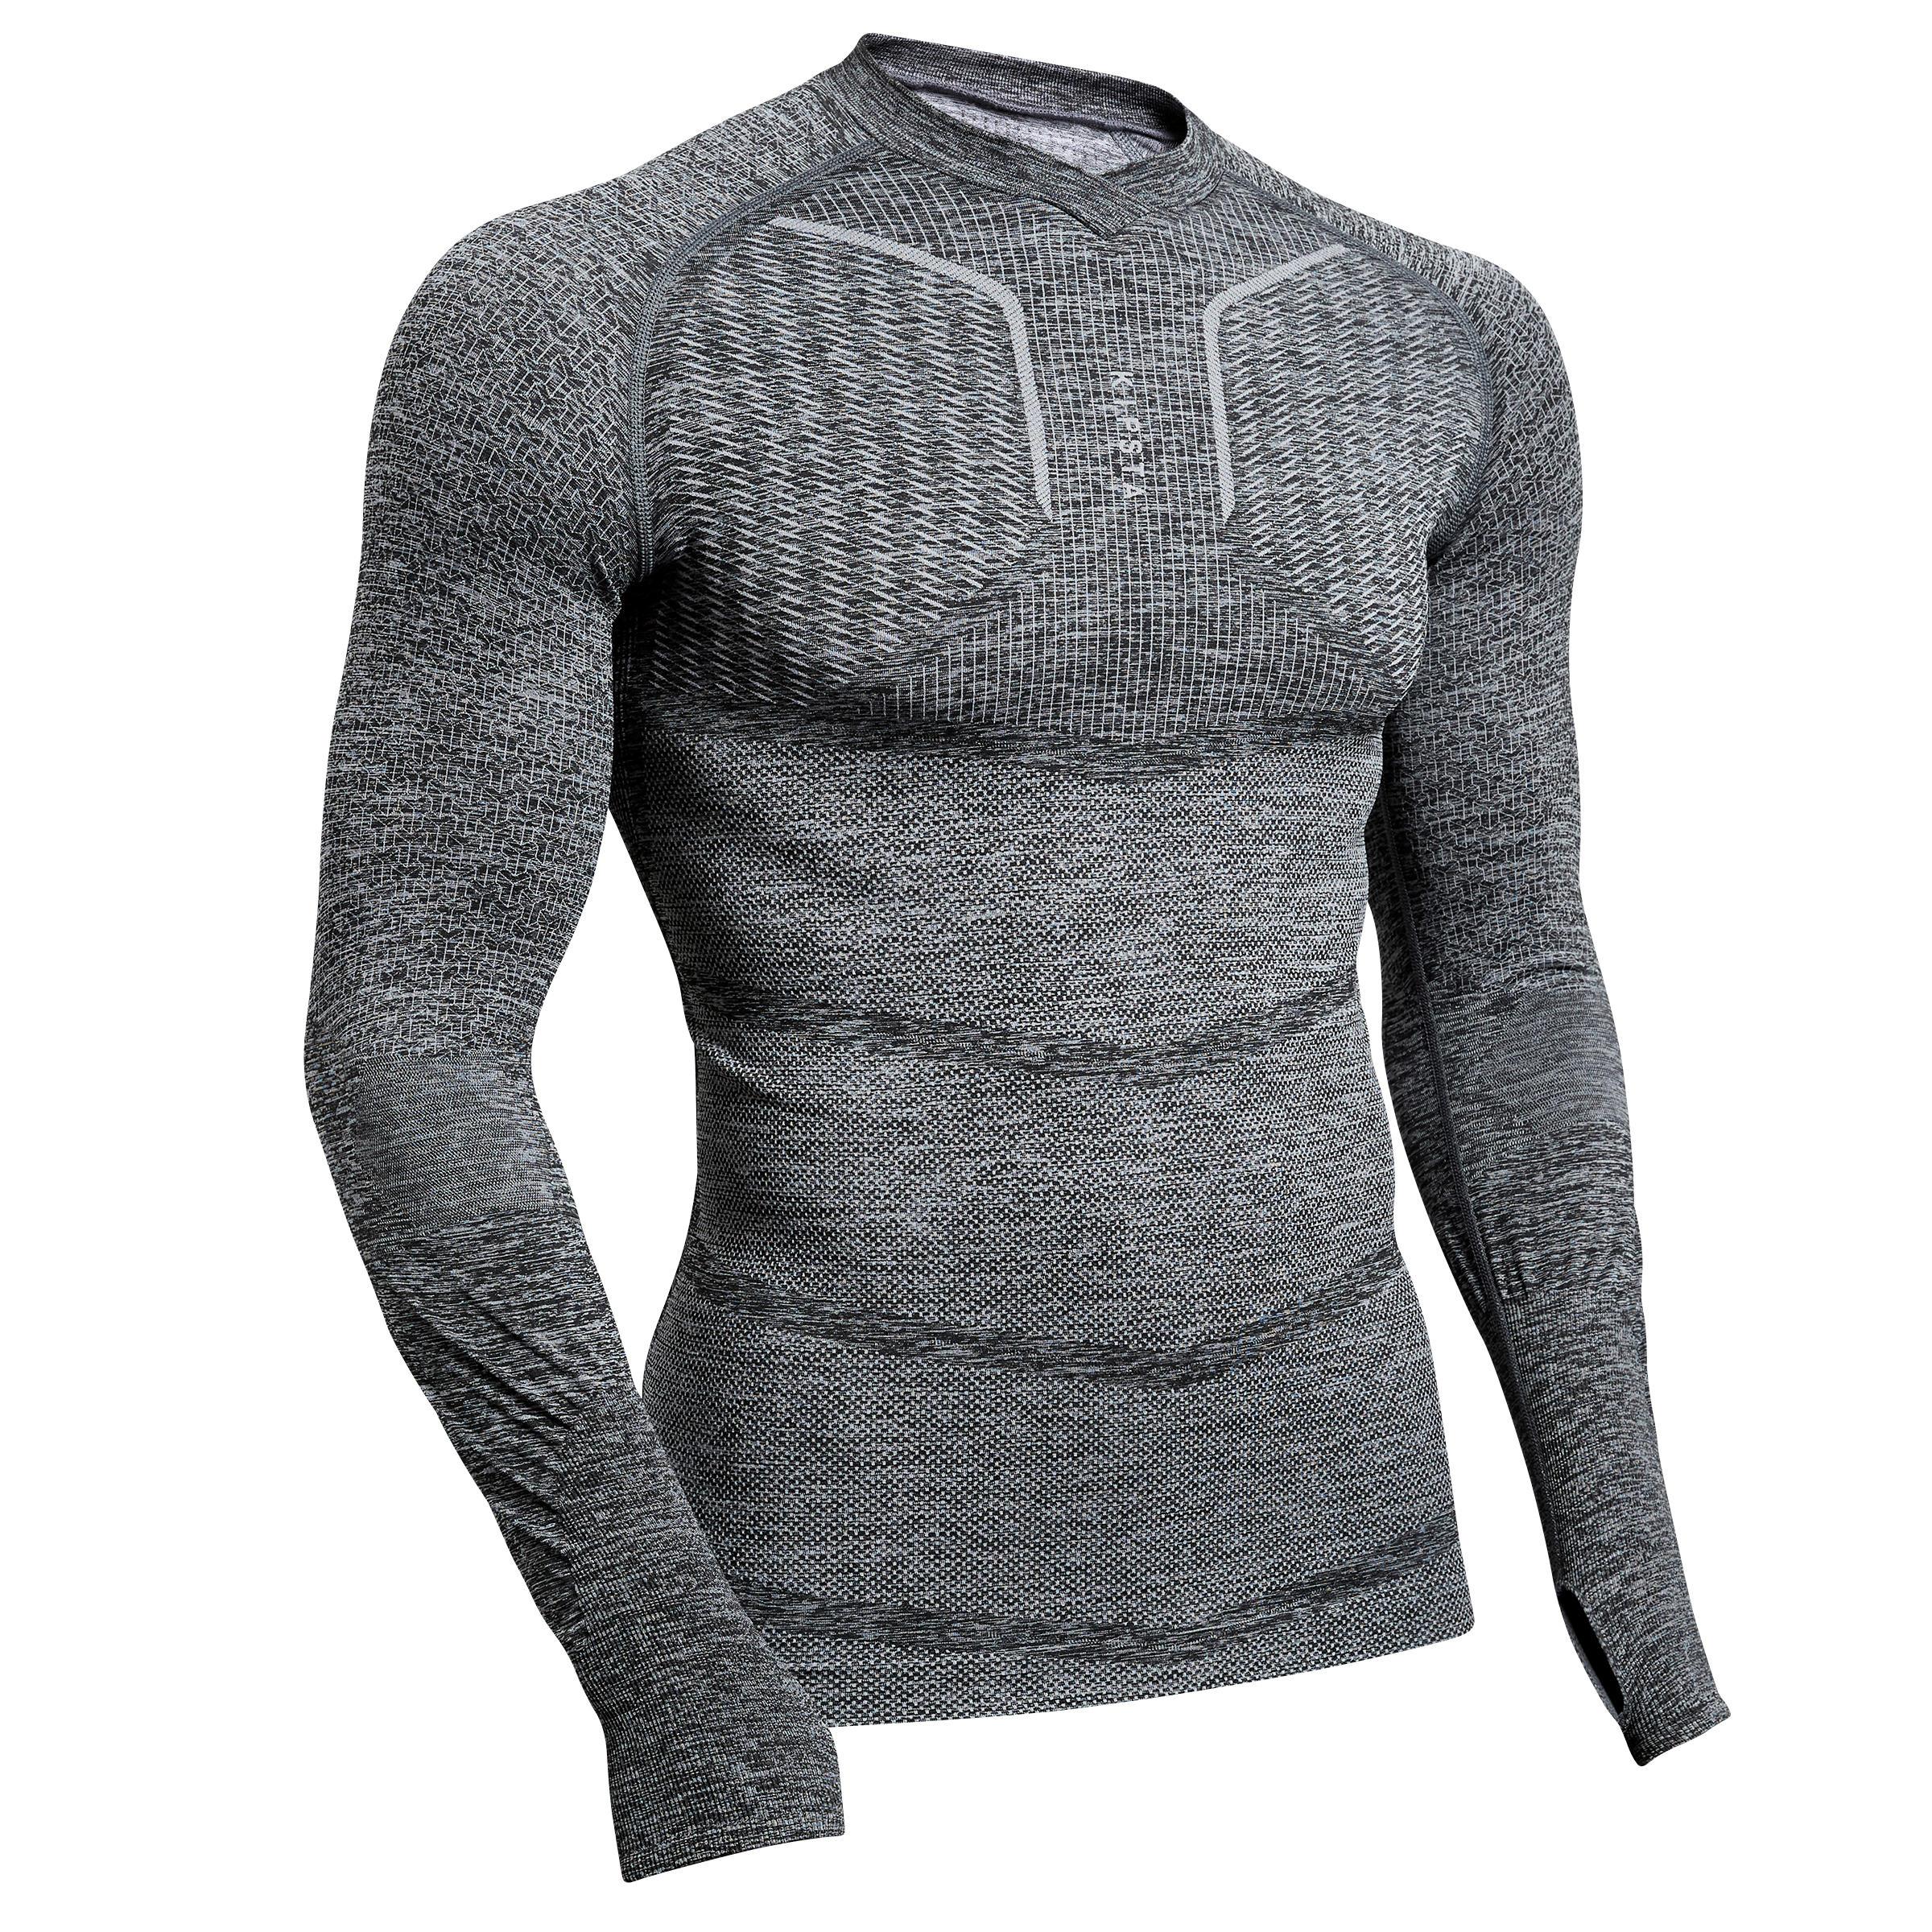 Funktionsshirt langarm Keepdry 500 atmungsaktiv Erwachsene | Bekleidung > Shirts > Funktionsshirts | Kipsta